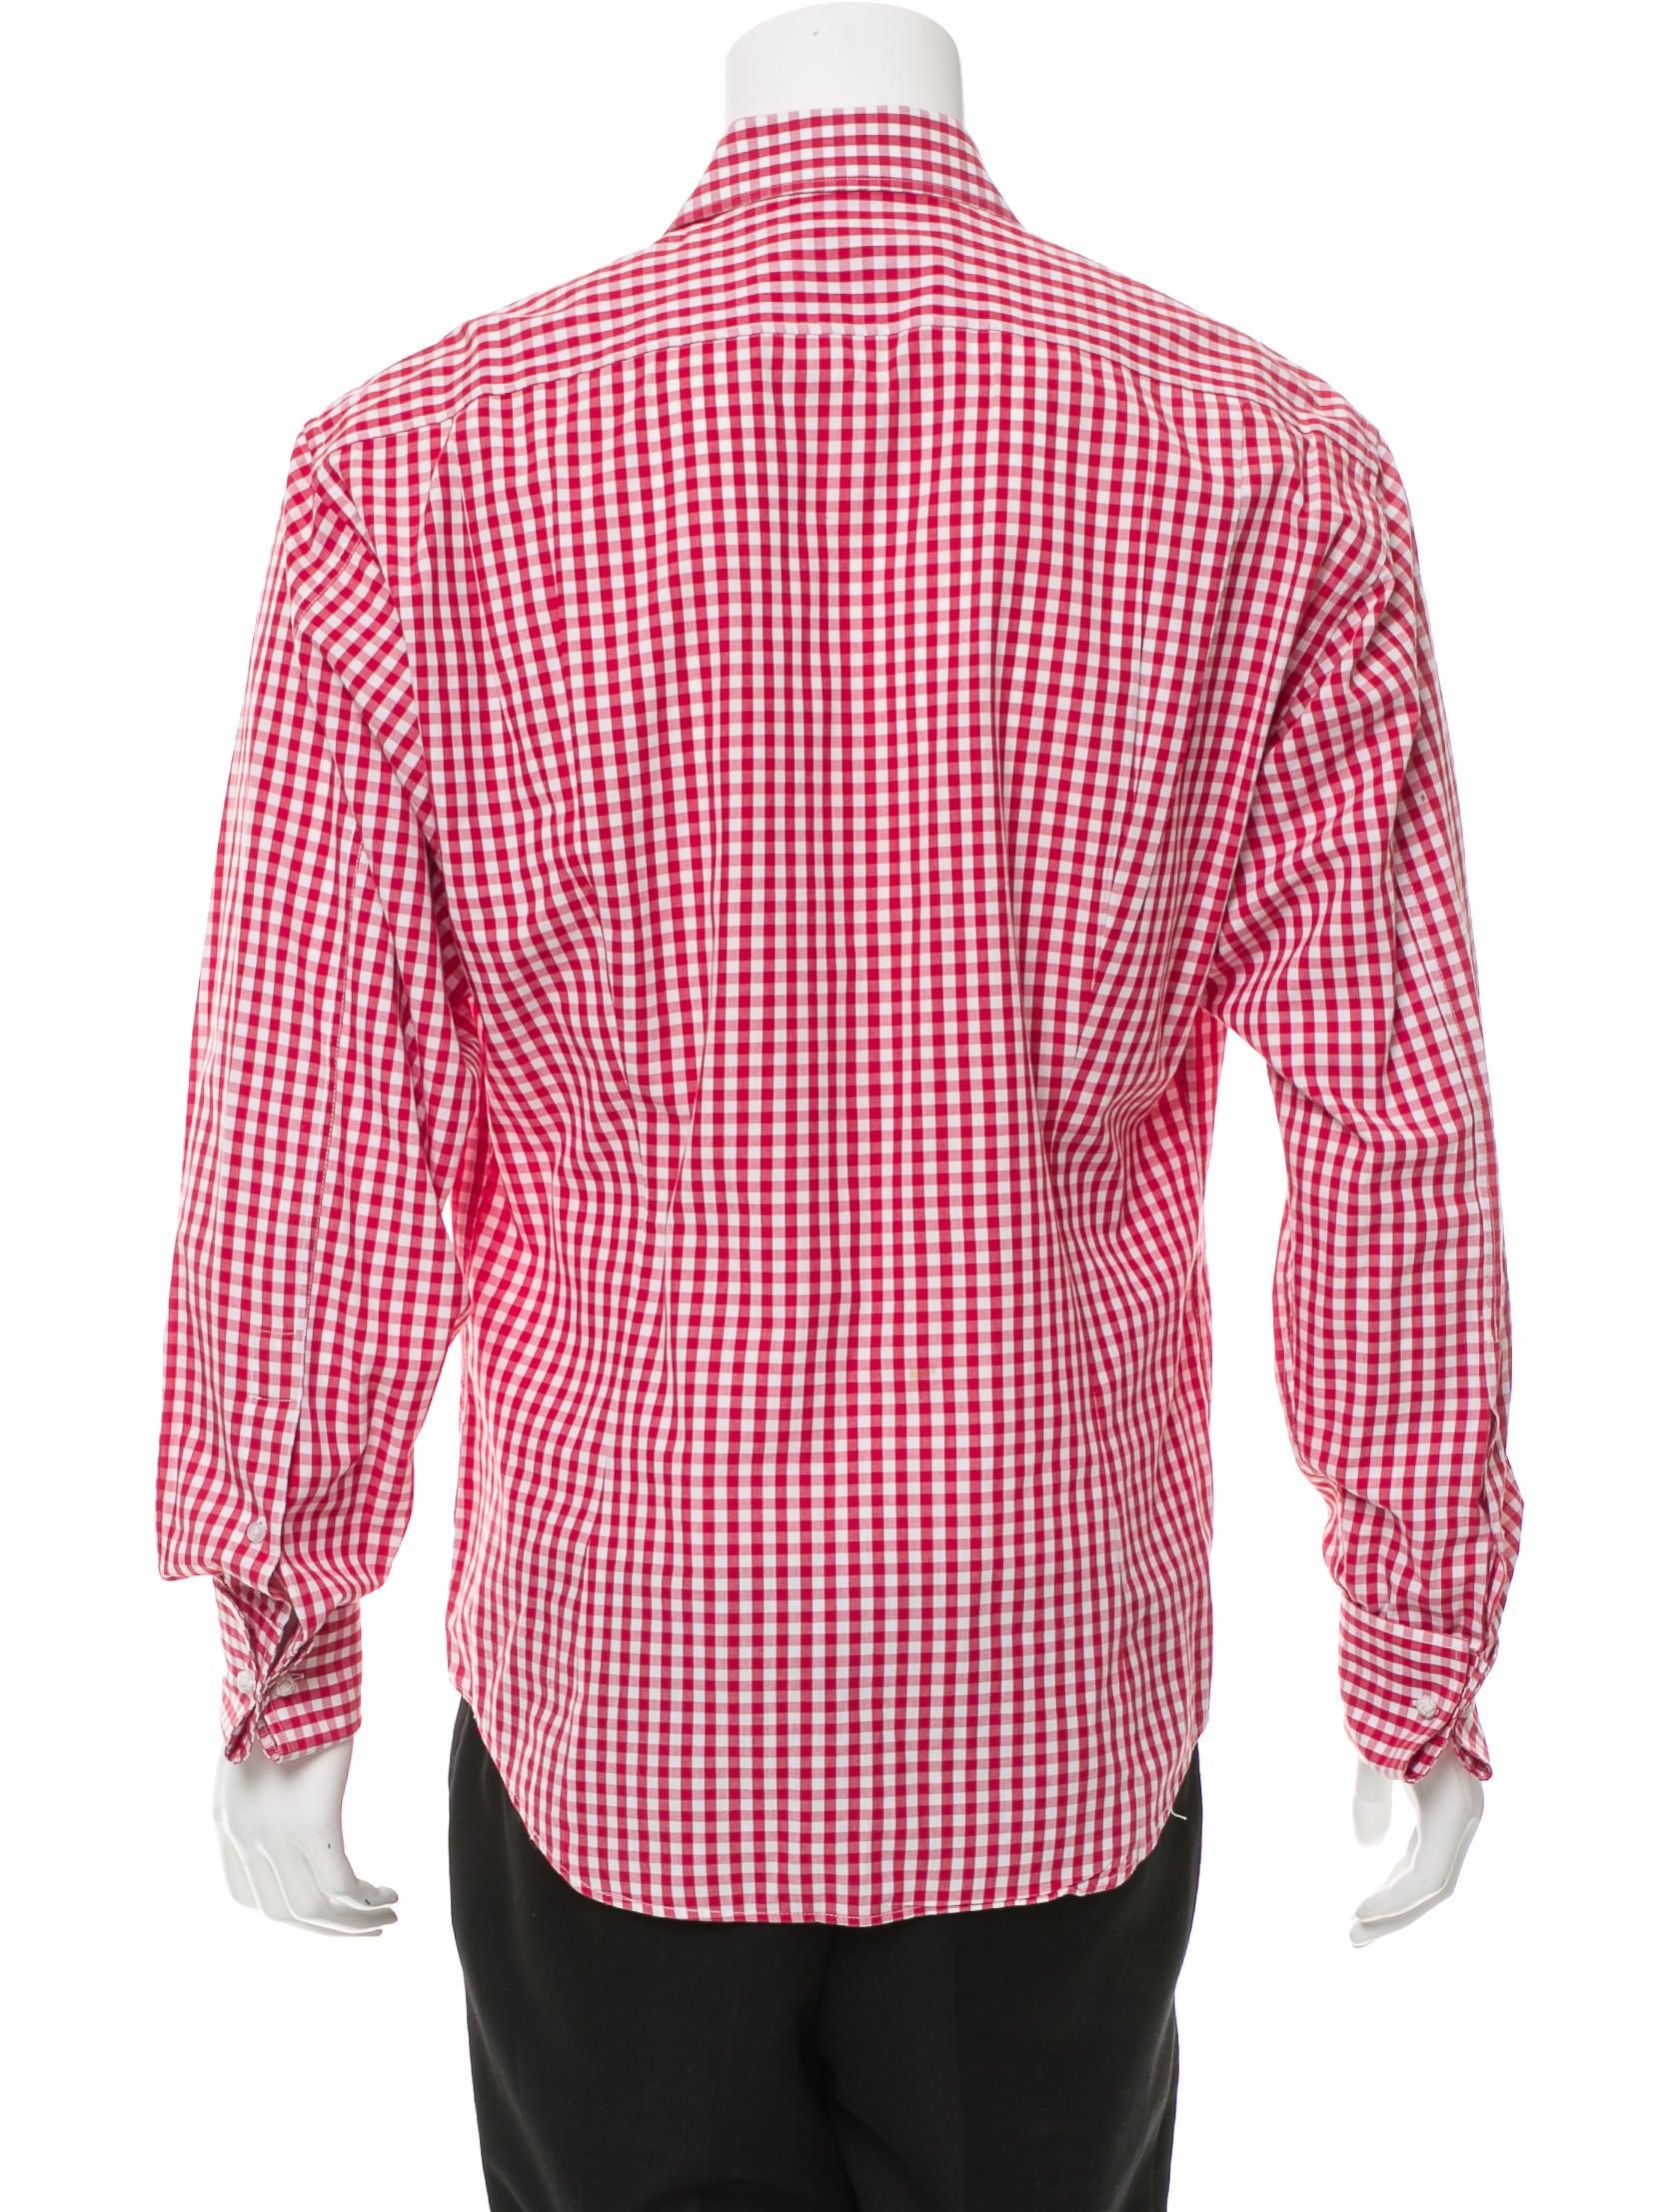 Yves Saint Laurent French Cuff Gingham Shirt Clothing